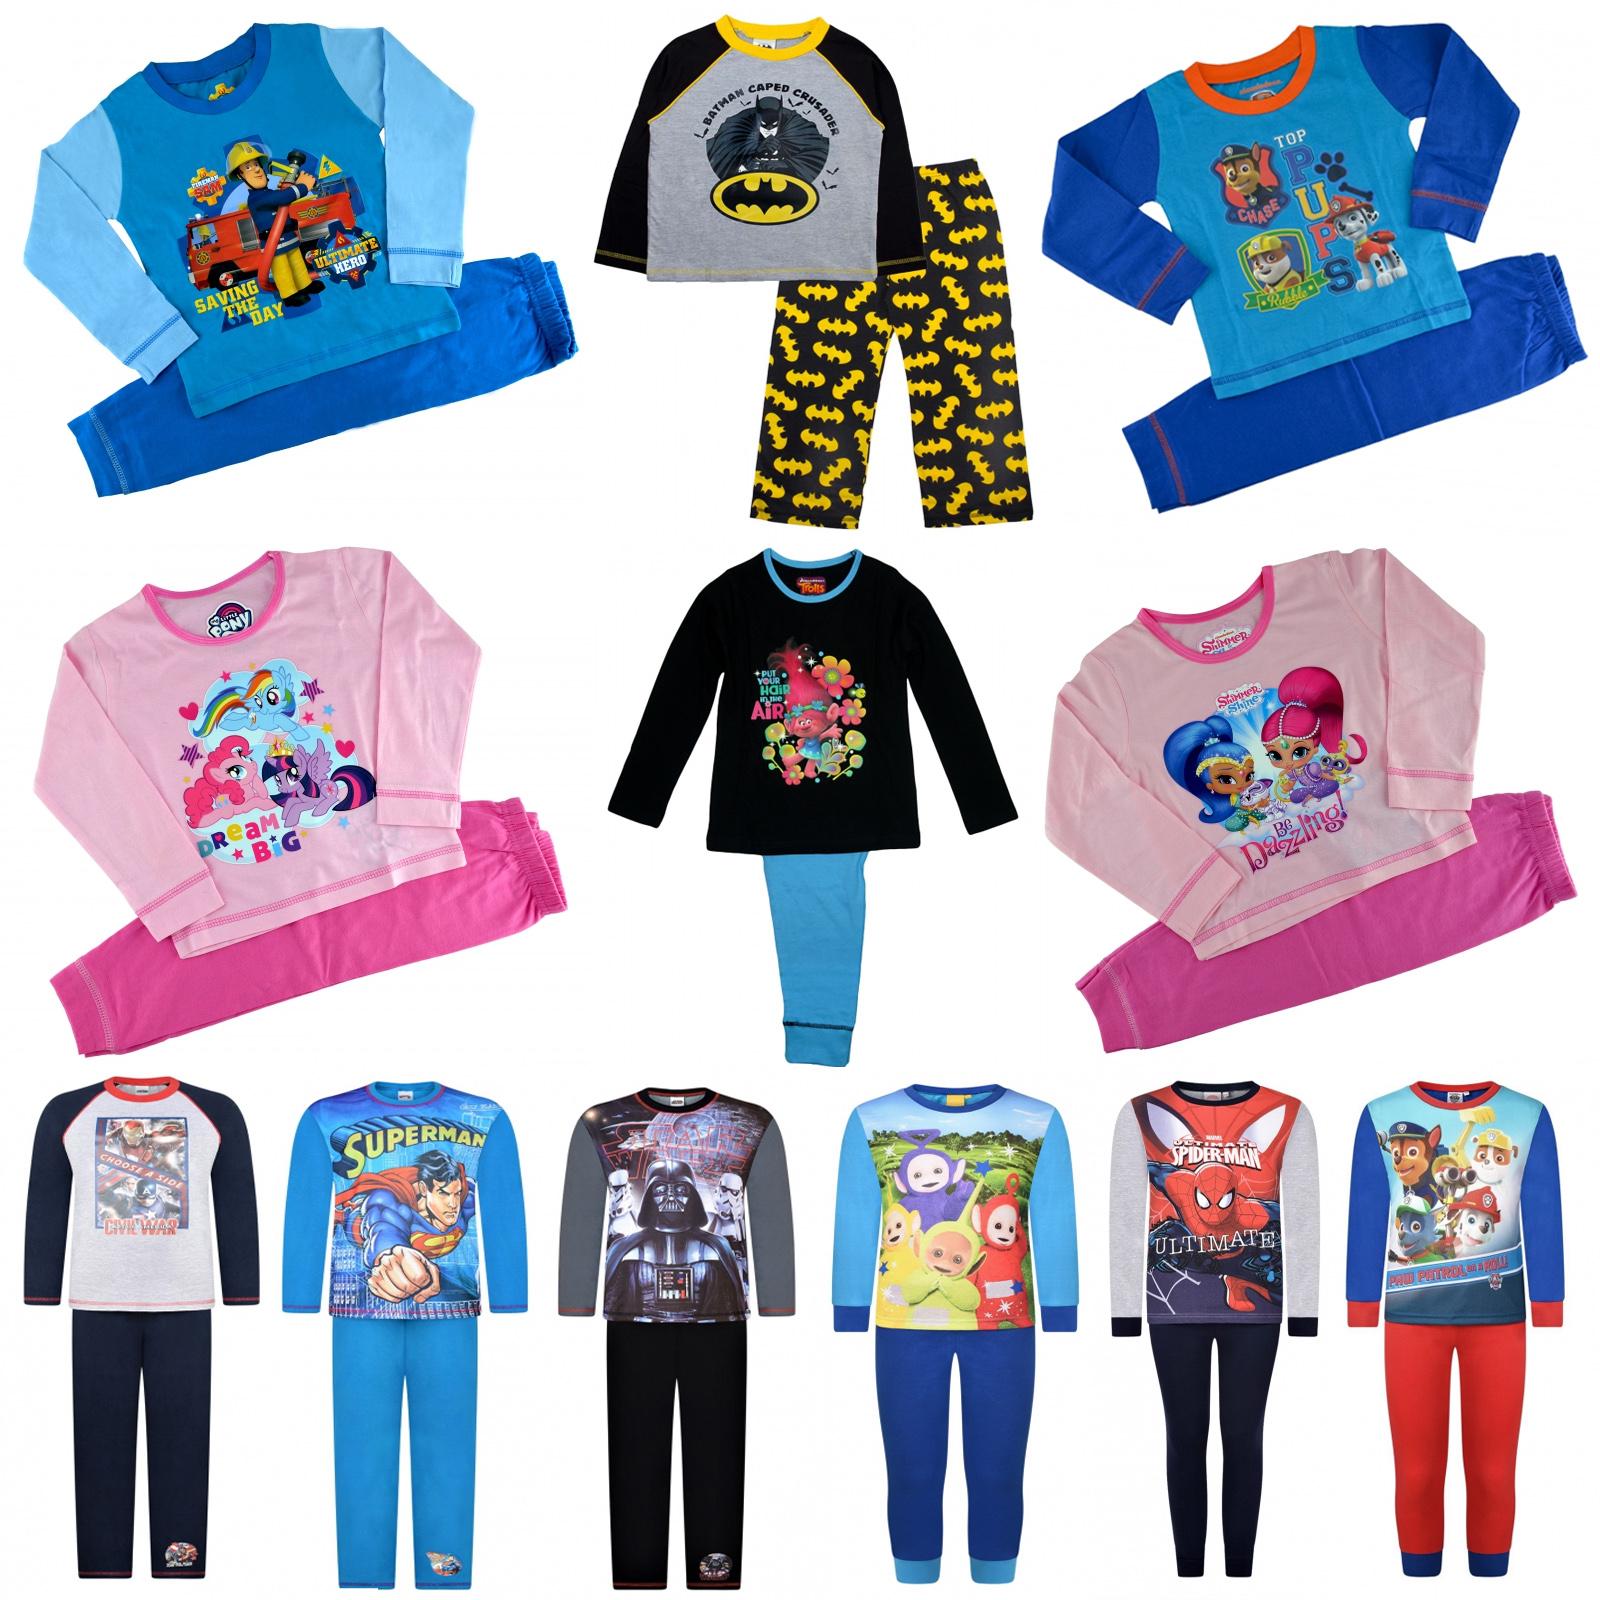 Offcial Kids Characters Disney Marvel Boys Girls 2pcs Pyjamas Set Sleepwear PJs